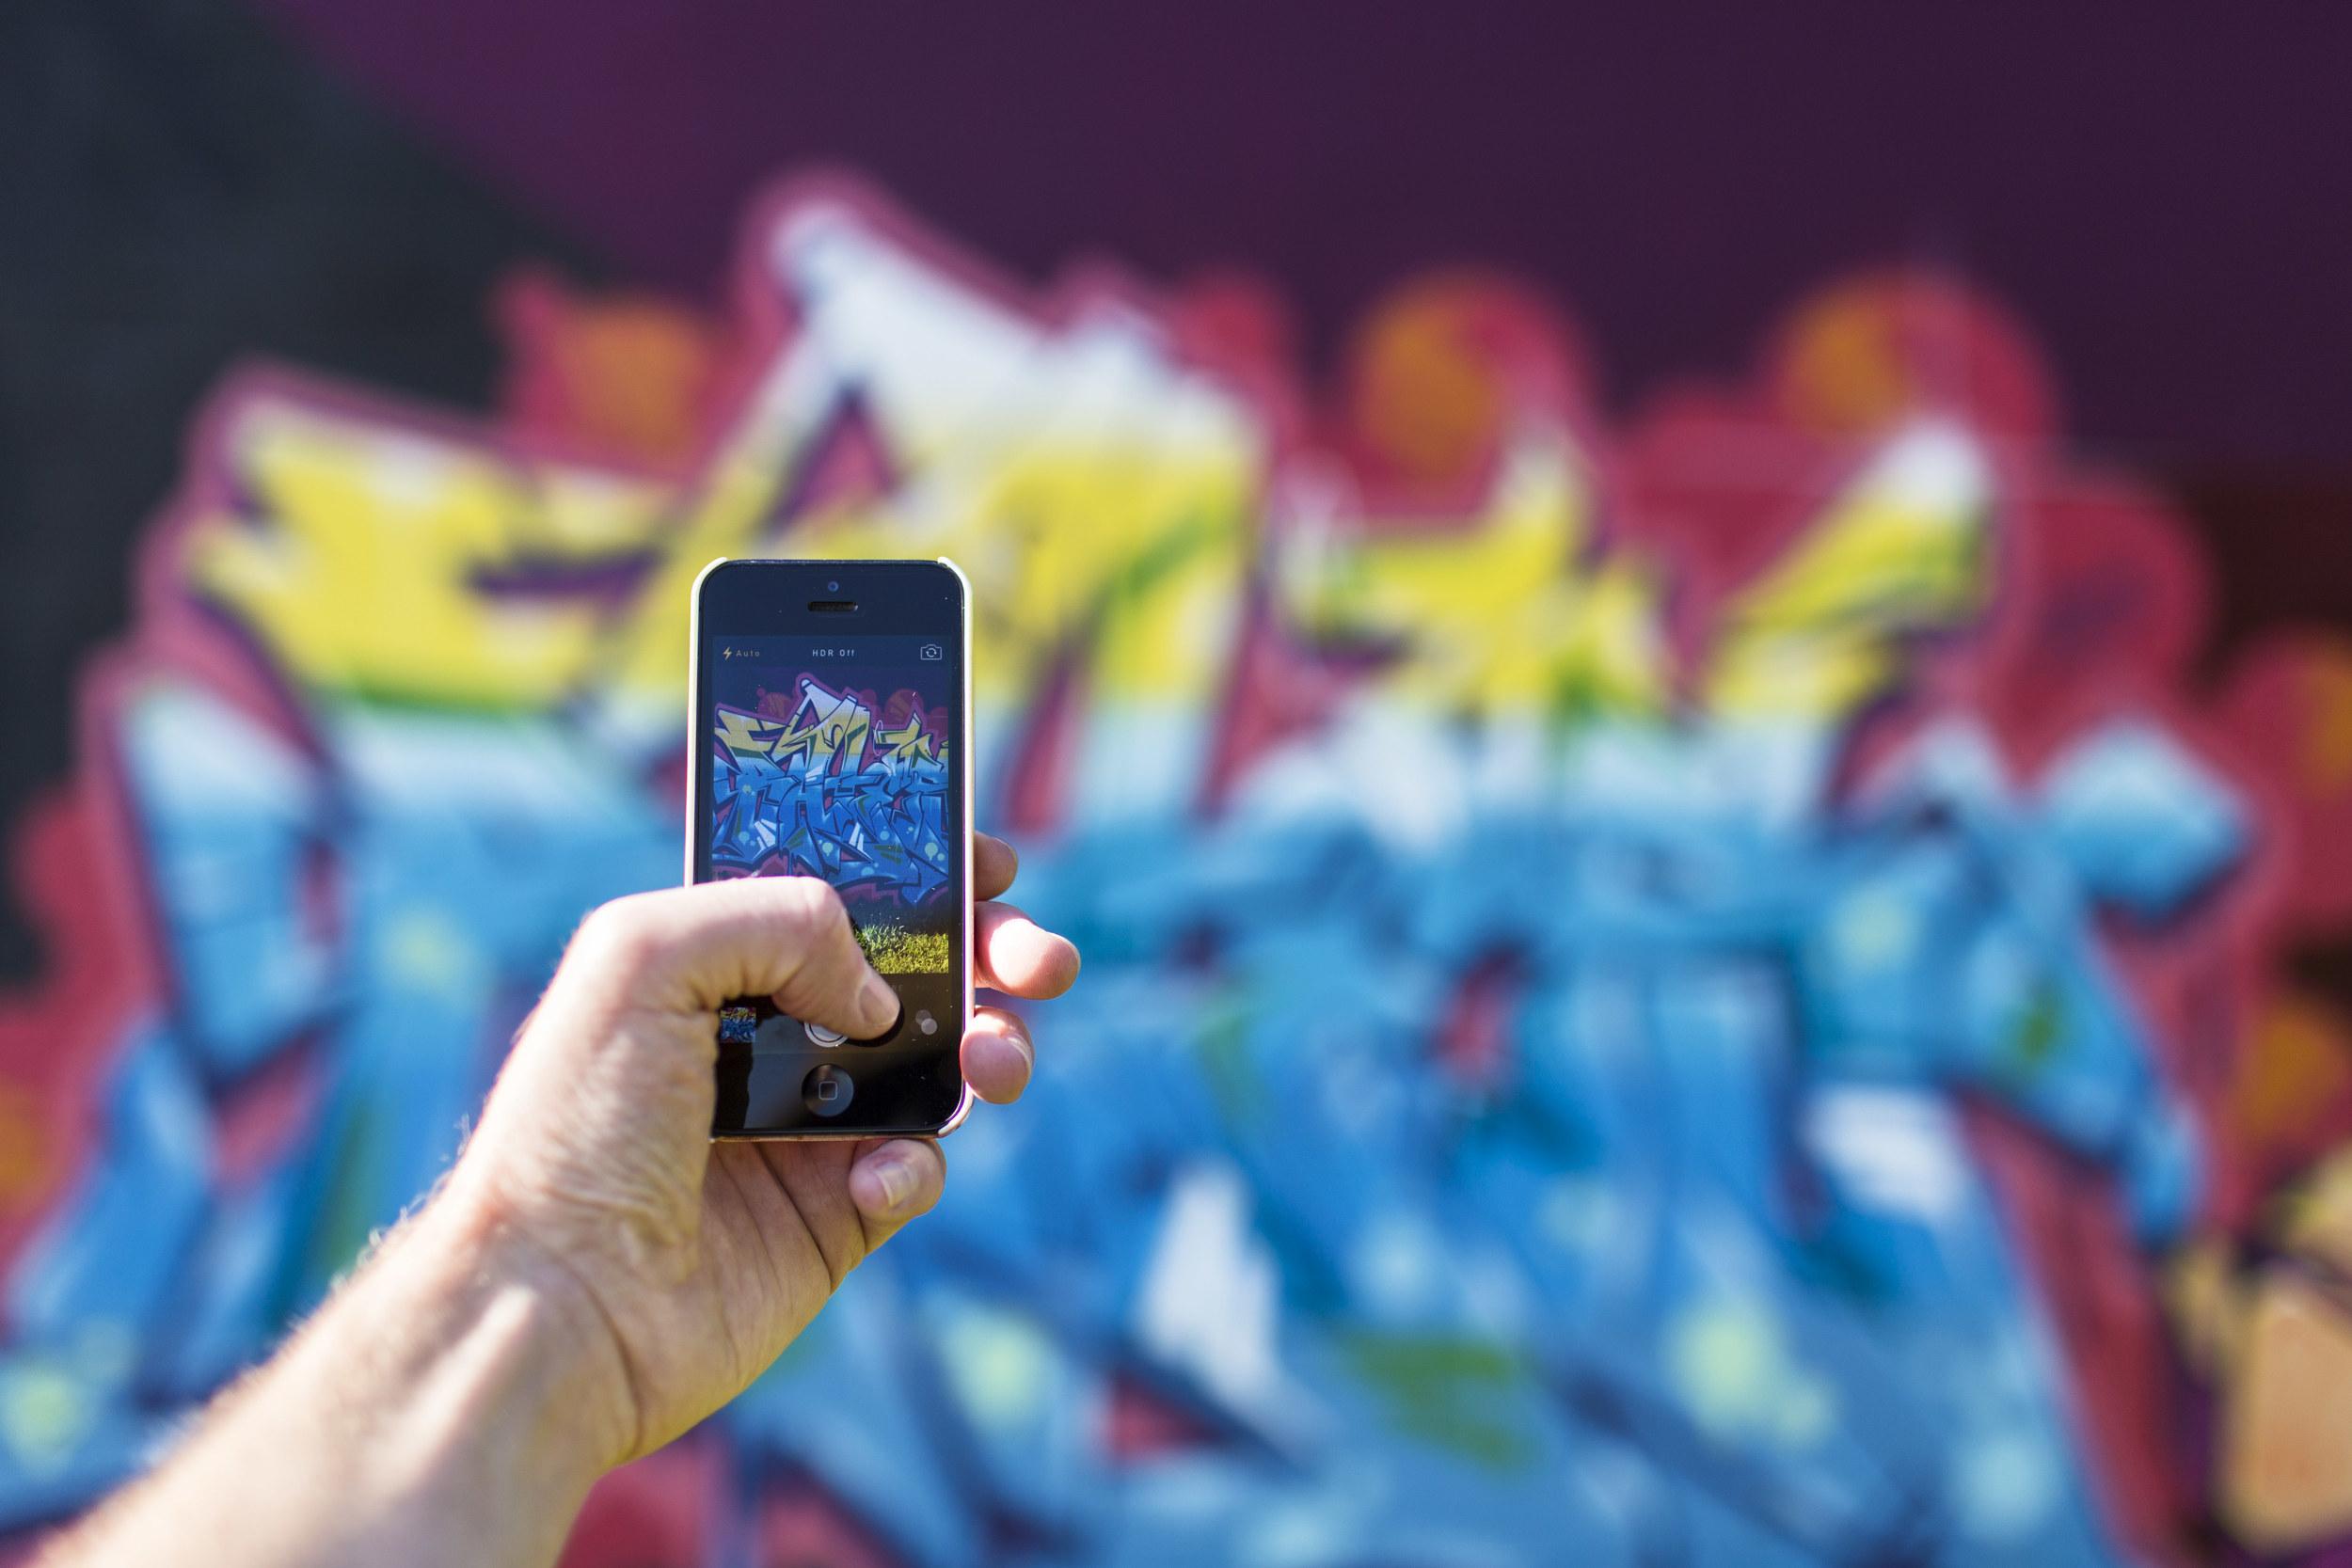 Smartphone taking photo of graffiti